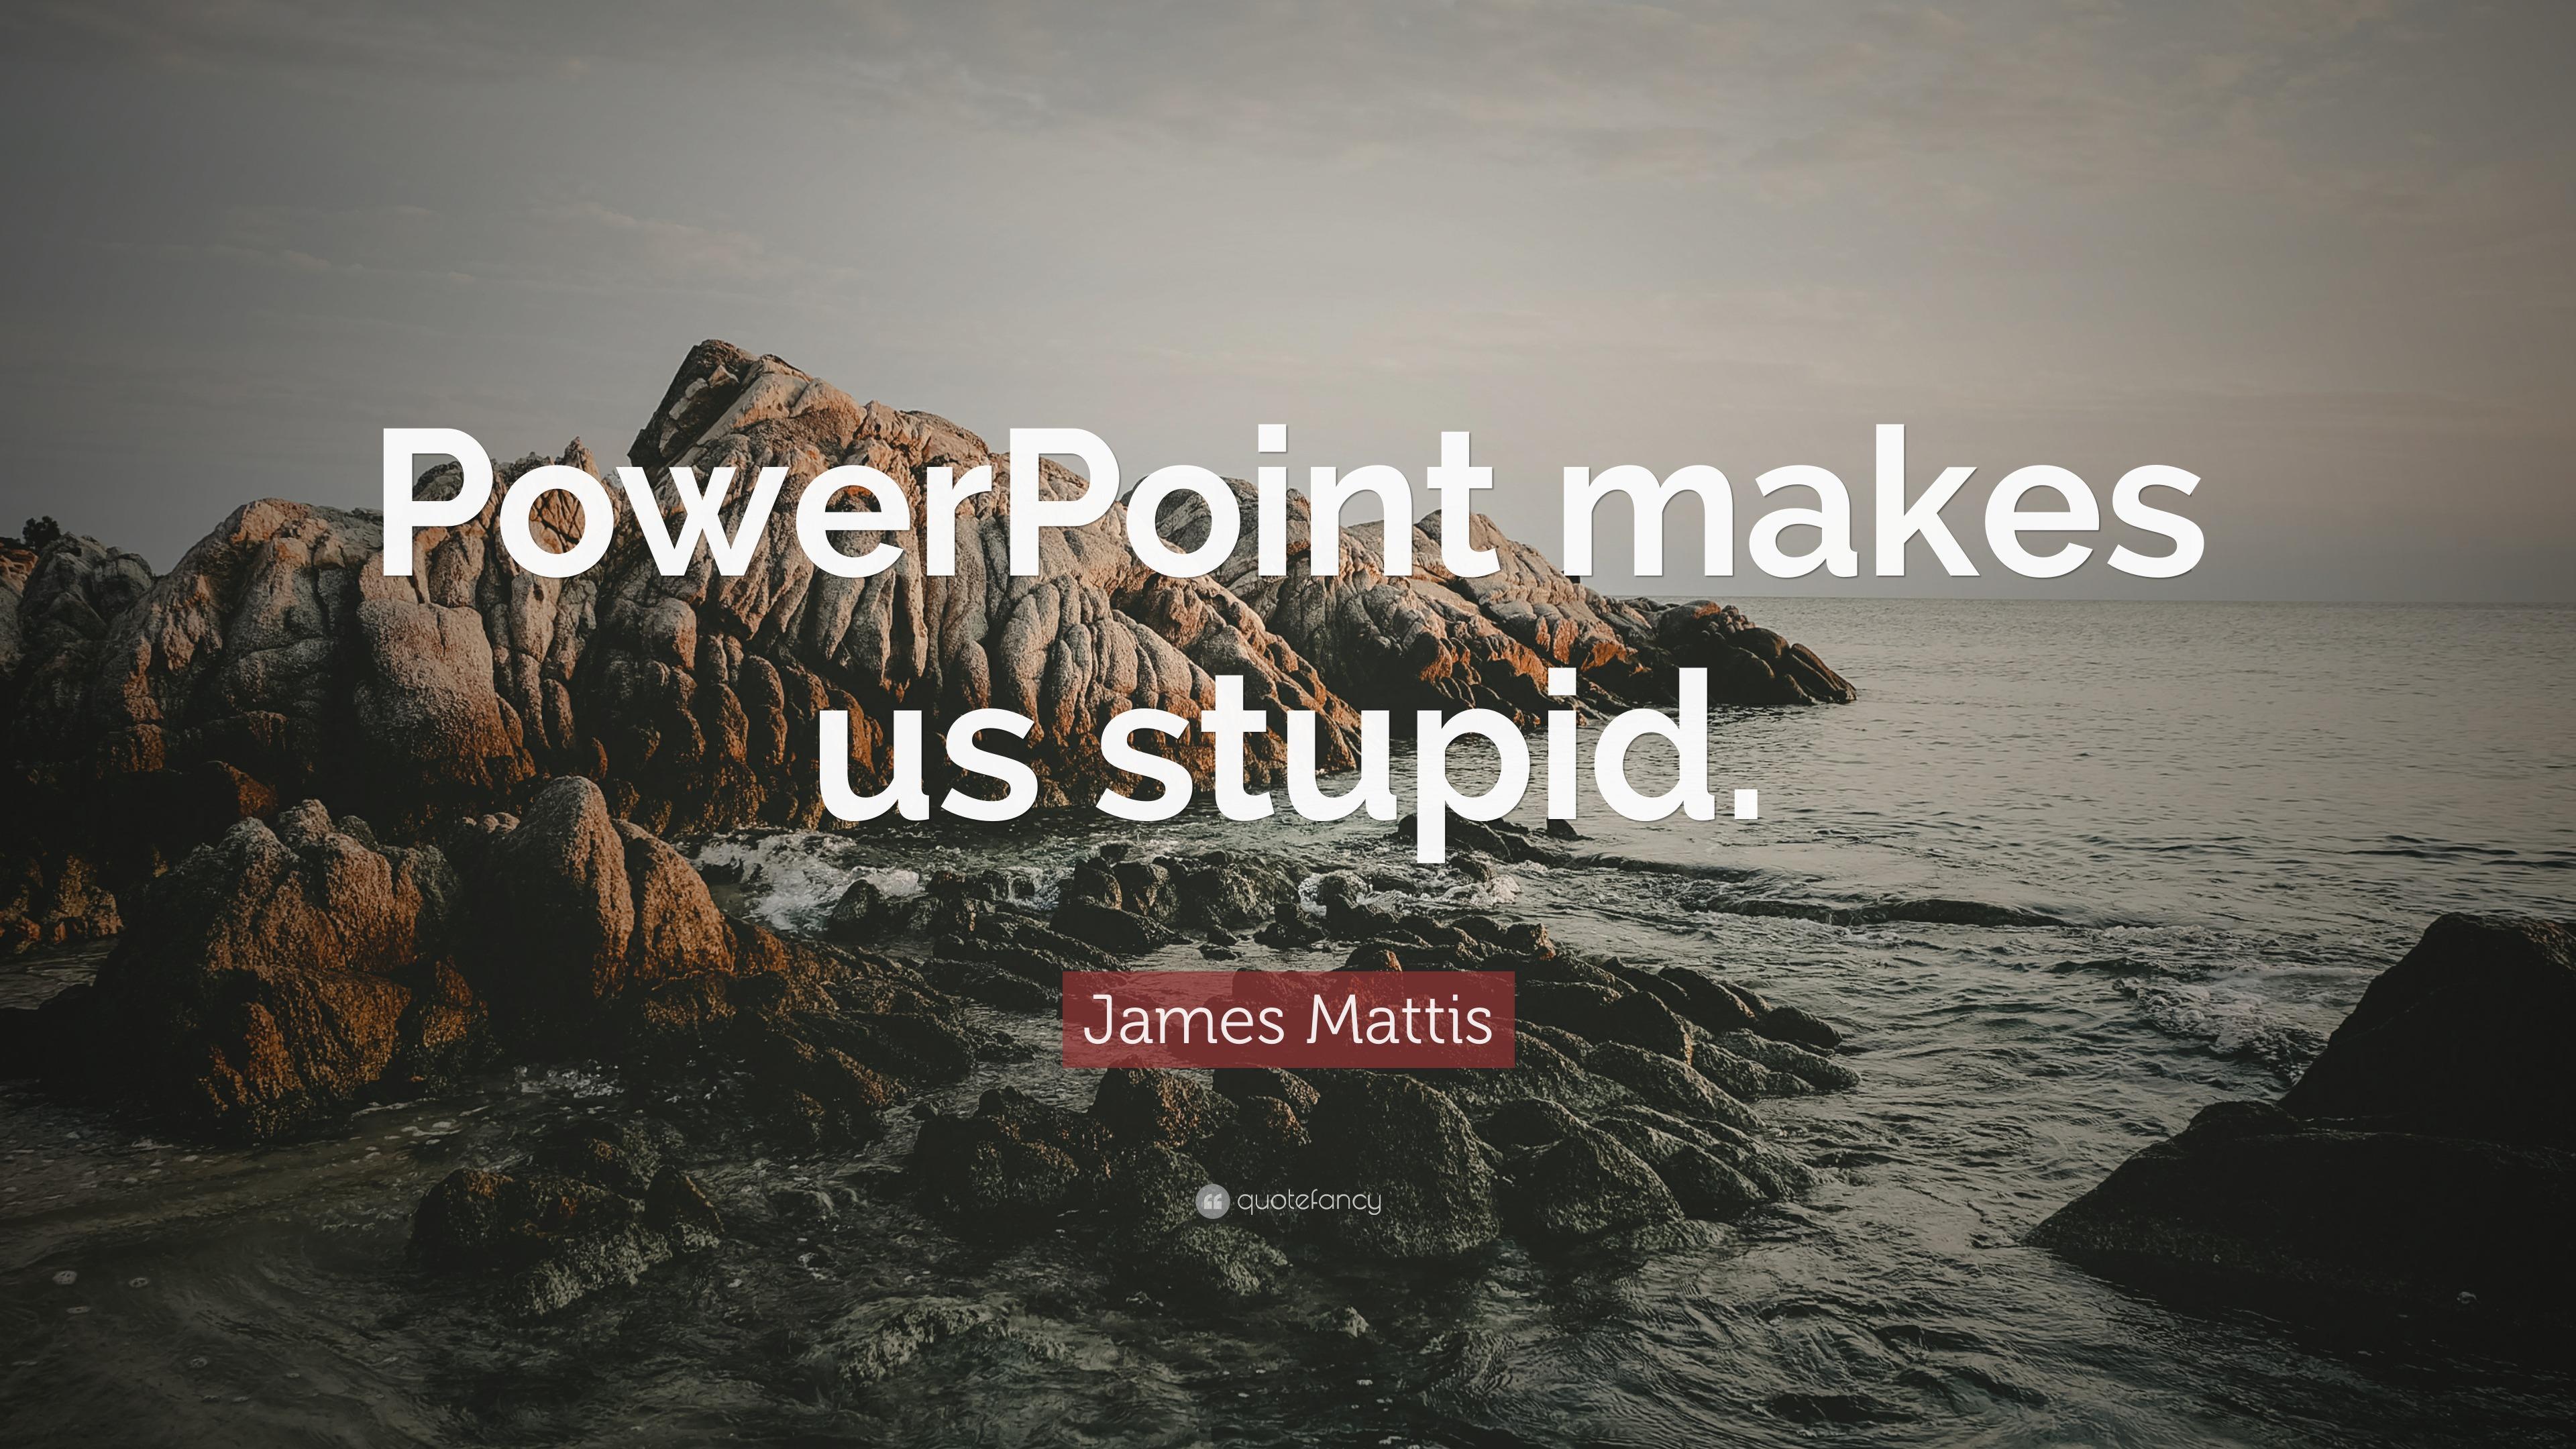 Steve Jobs Motivational Quotes Wallpaper James Mattis Quote Powerpoint Makes Us Stupid 12